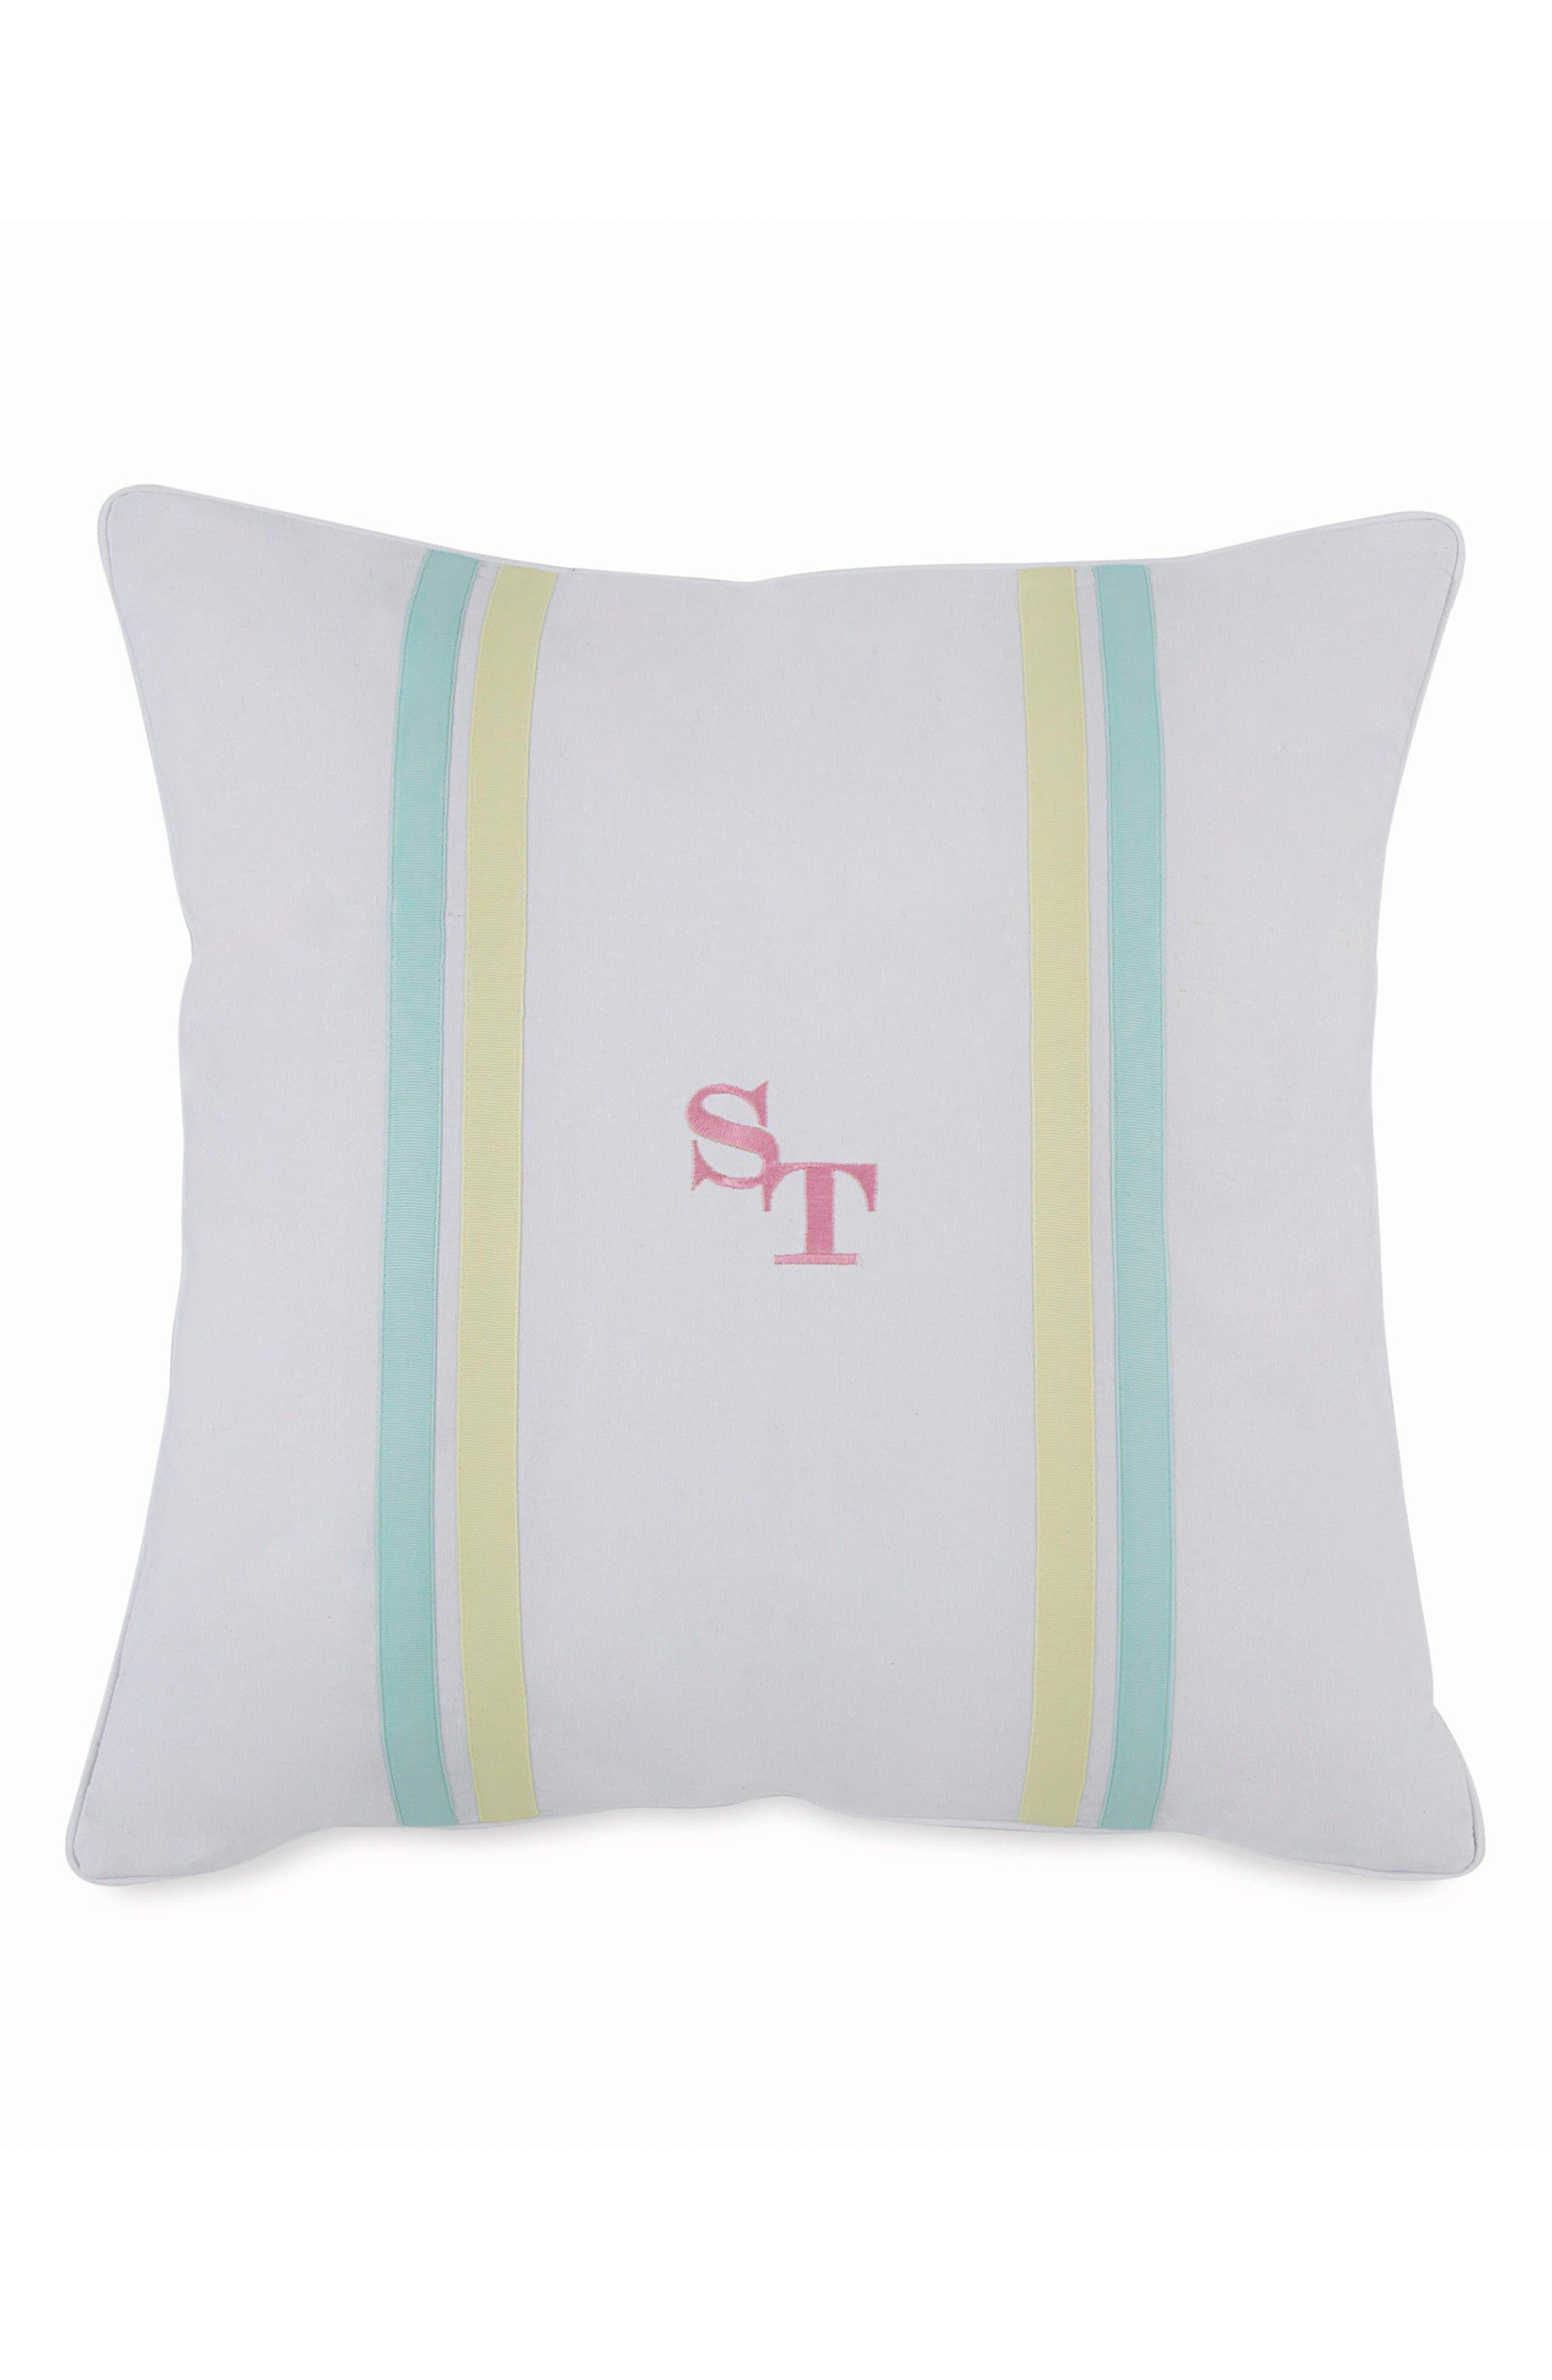 Tropical Retreat Accent Pillow,                             Main thumbnail 1, color,                             White Multi